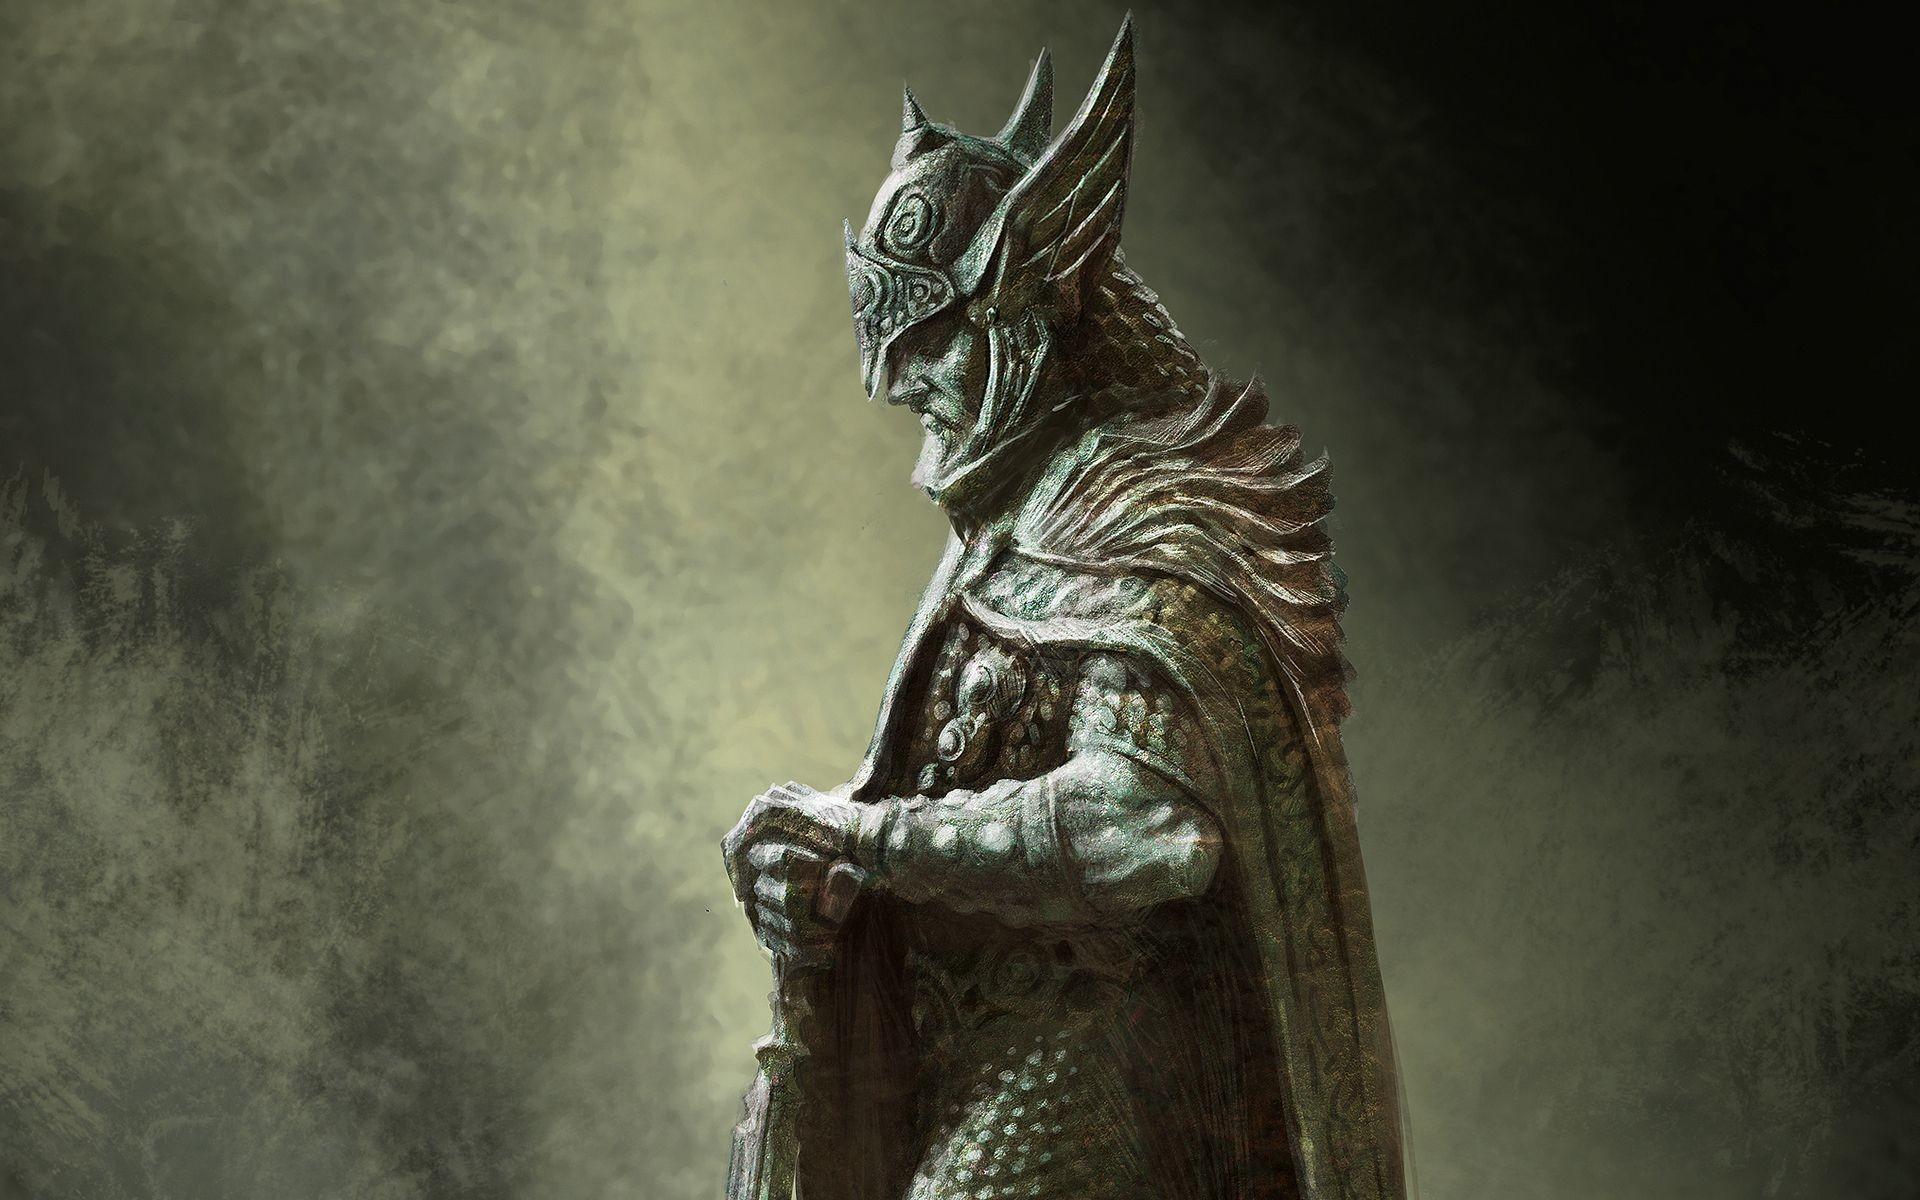 Res: 1920x1200, The Elder Scrolls V: Skyrim celtic Celtic Warrior wallpaper background